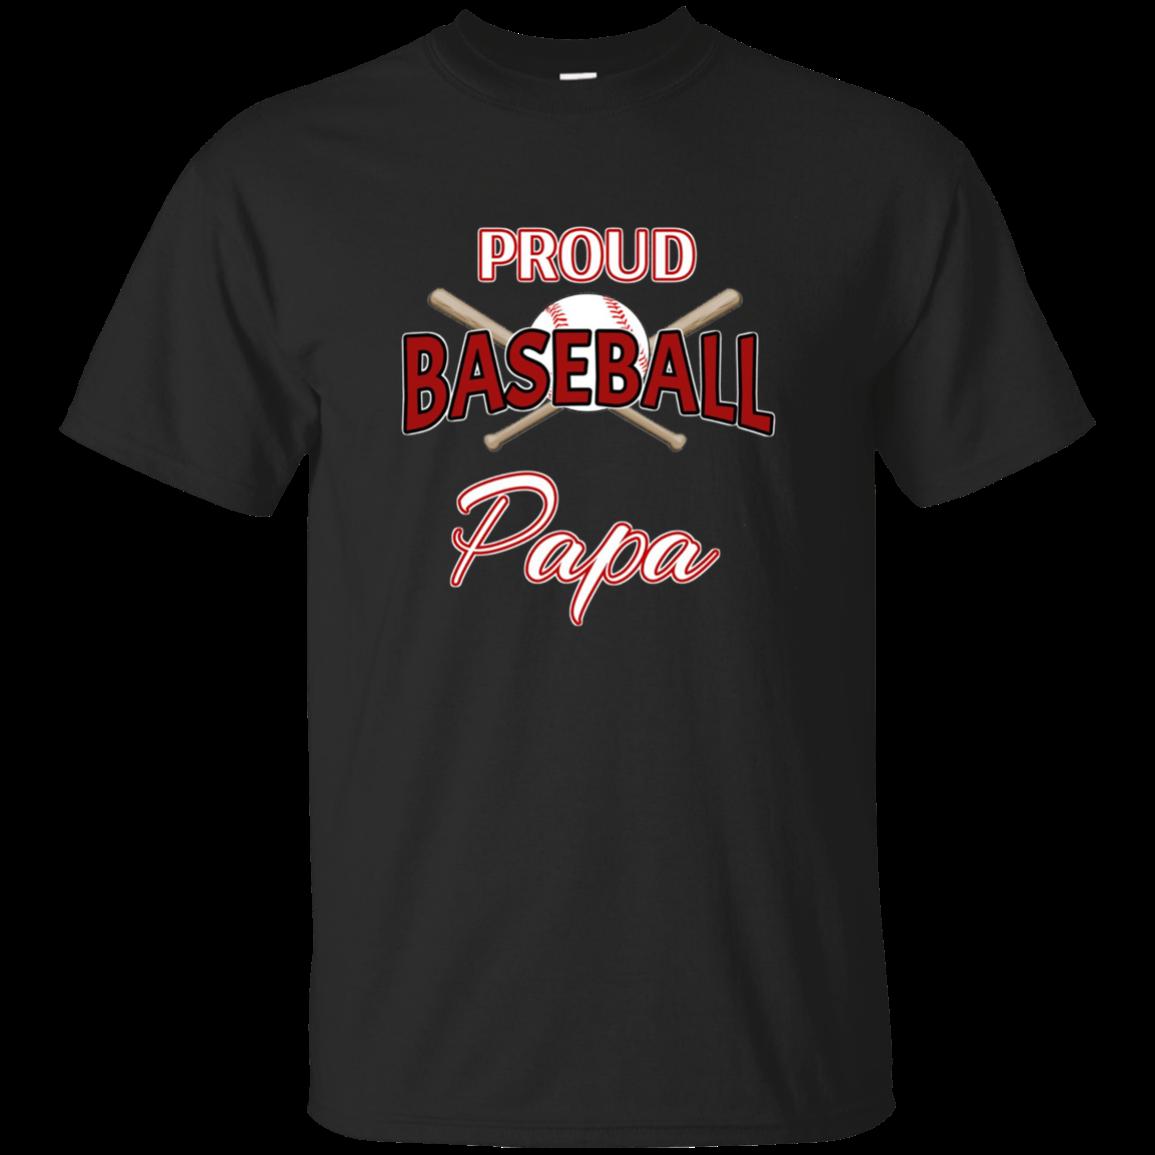 Proud Baseball Papa Shirt Baseball Papa Tshirt